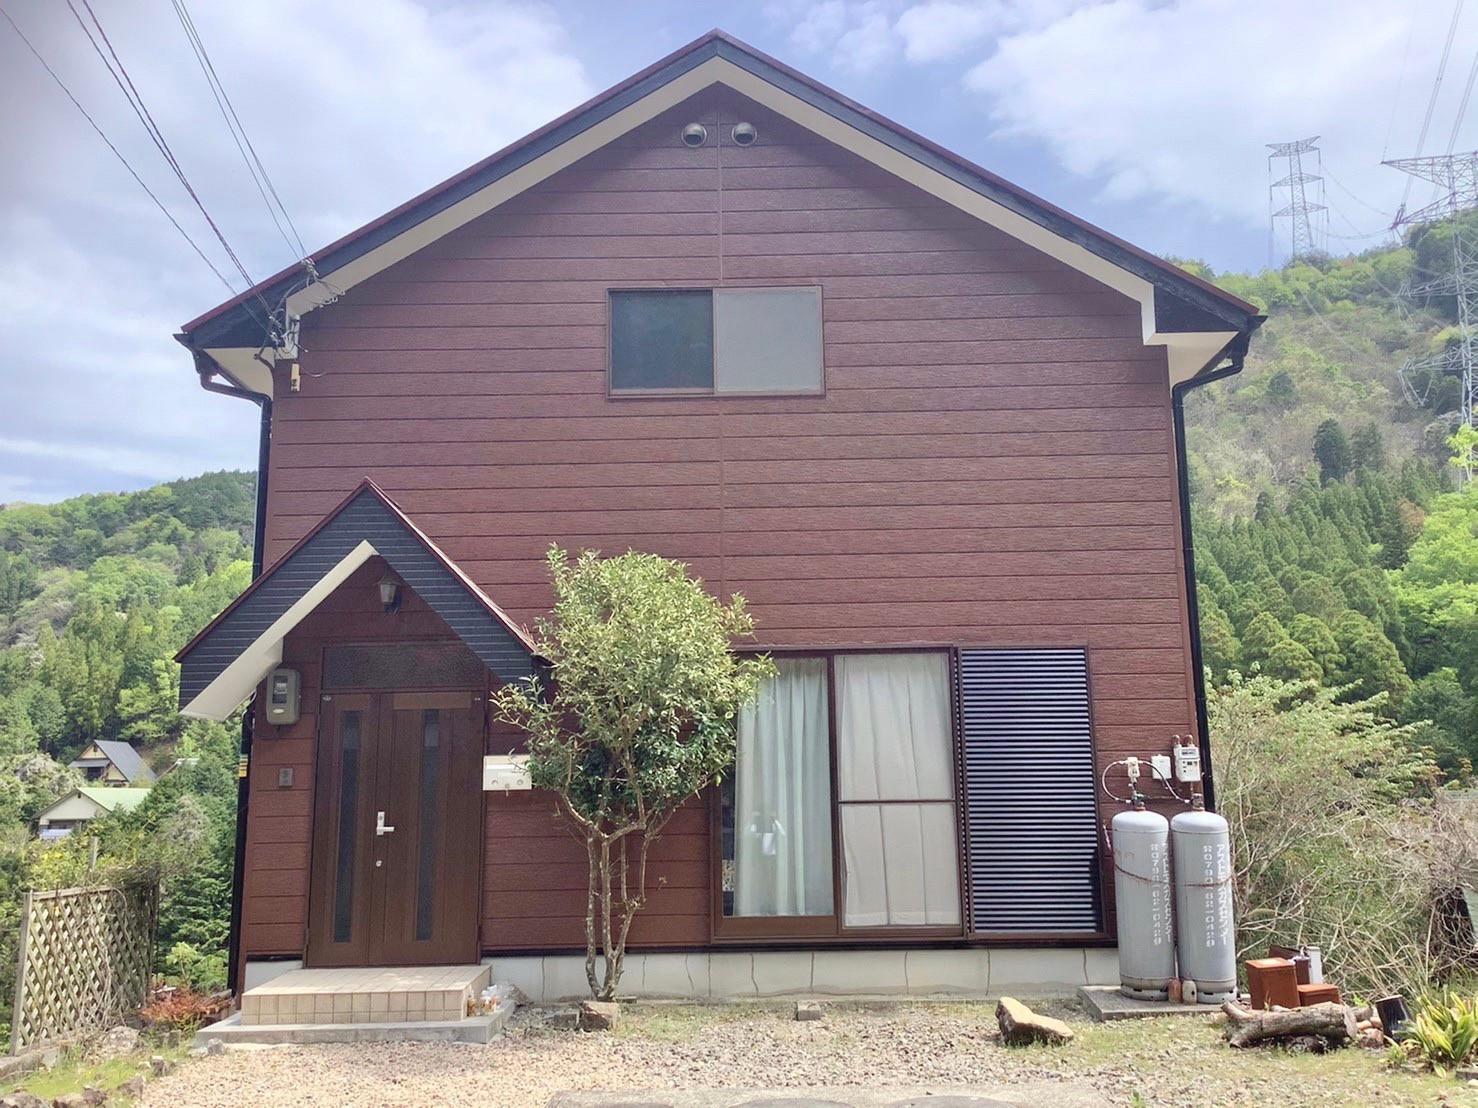 外壁・屋根塗装 別荘 シリコンREVO1000